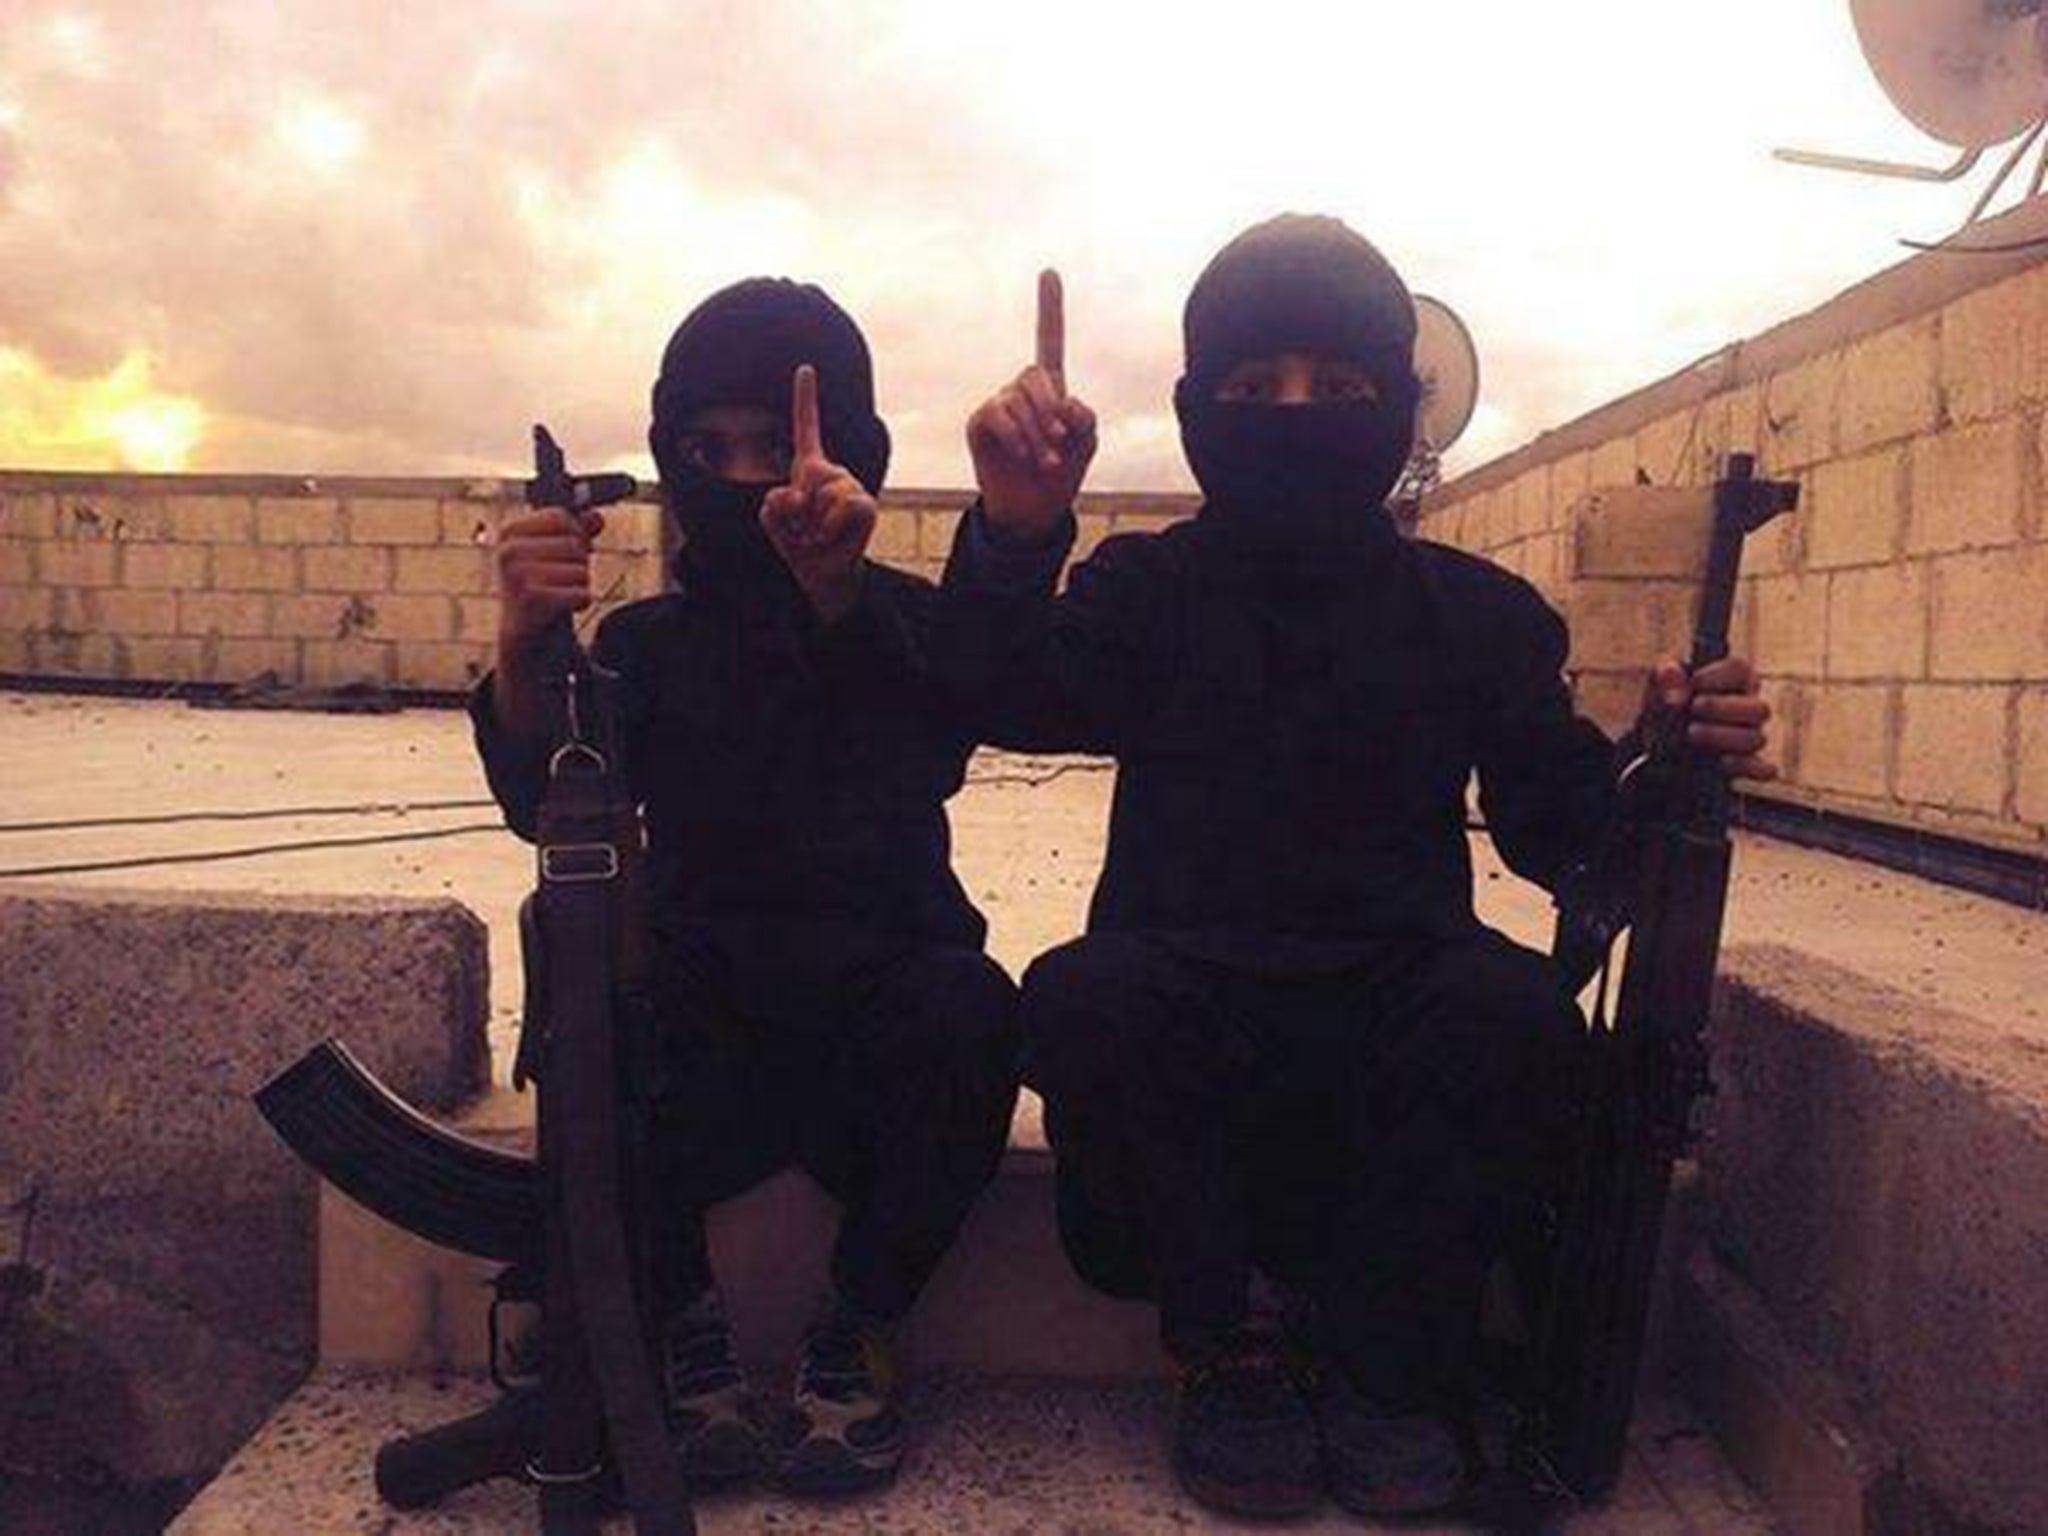 dating jihad Jihad (english: / dʒ ɪ ˈ h ɑː d / arabic: جهاد  jihād [dʒɪˈhaːd]) is an arabic word which literally means striving or struggling, especially with a praiseworthy aim.